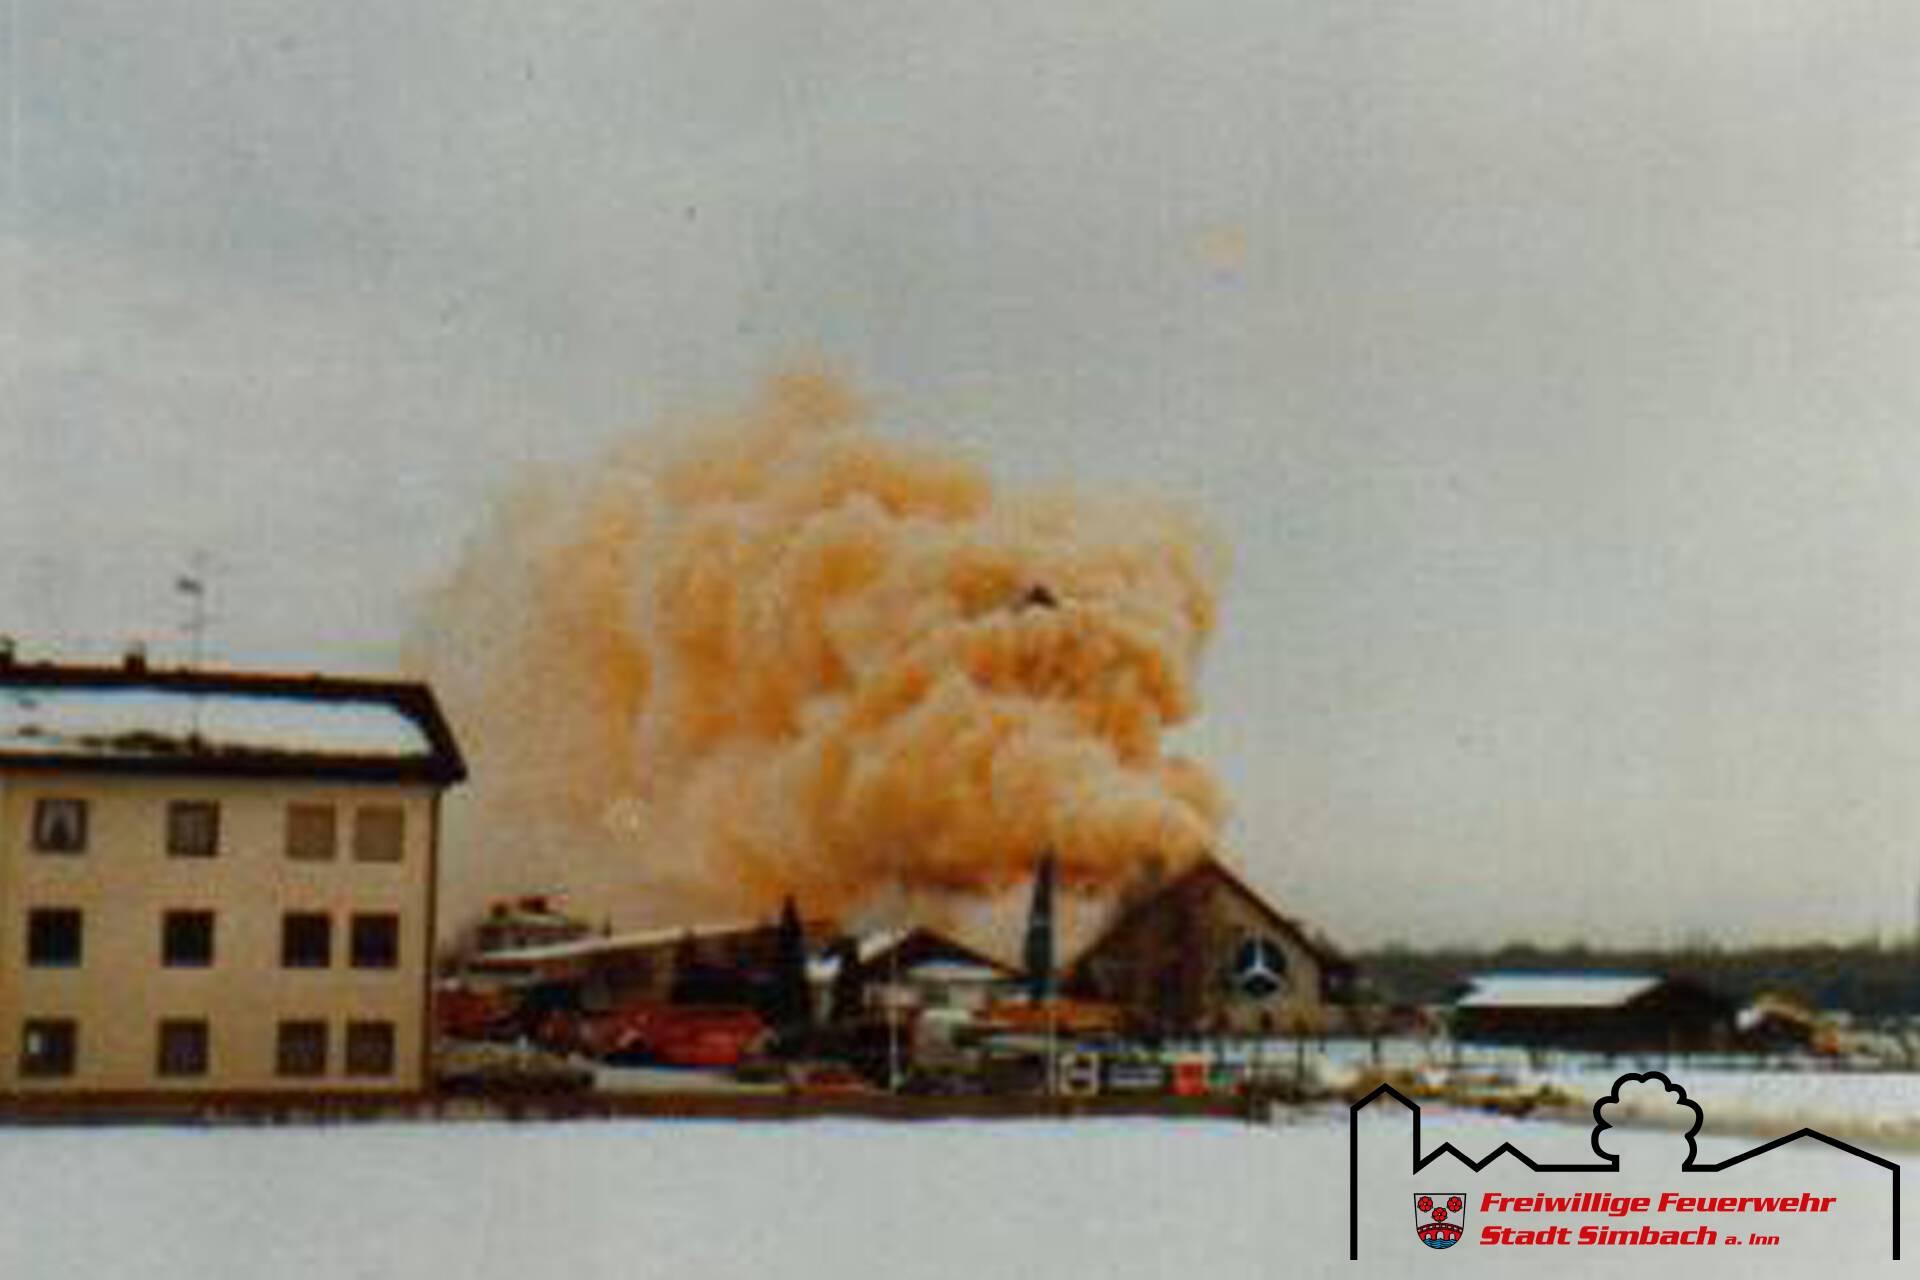 Brand Lagerhaus Oberlechner 12.12.1980 (4)